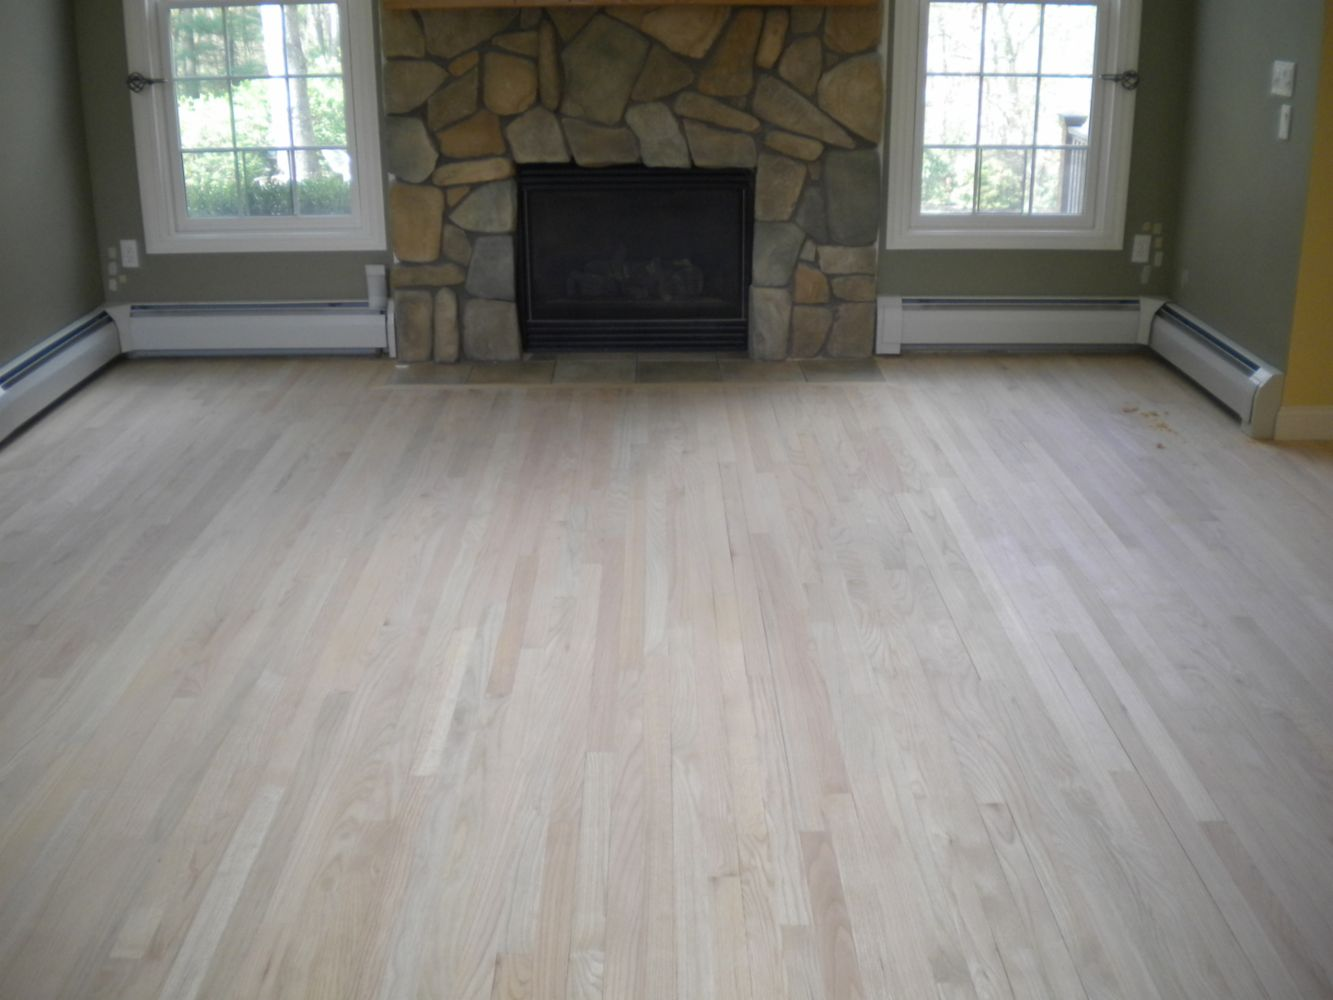 Hardwood flooring in lexington ma mark 39 s master service for Hardwood floors quincy ma